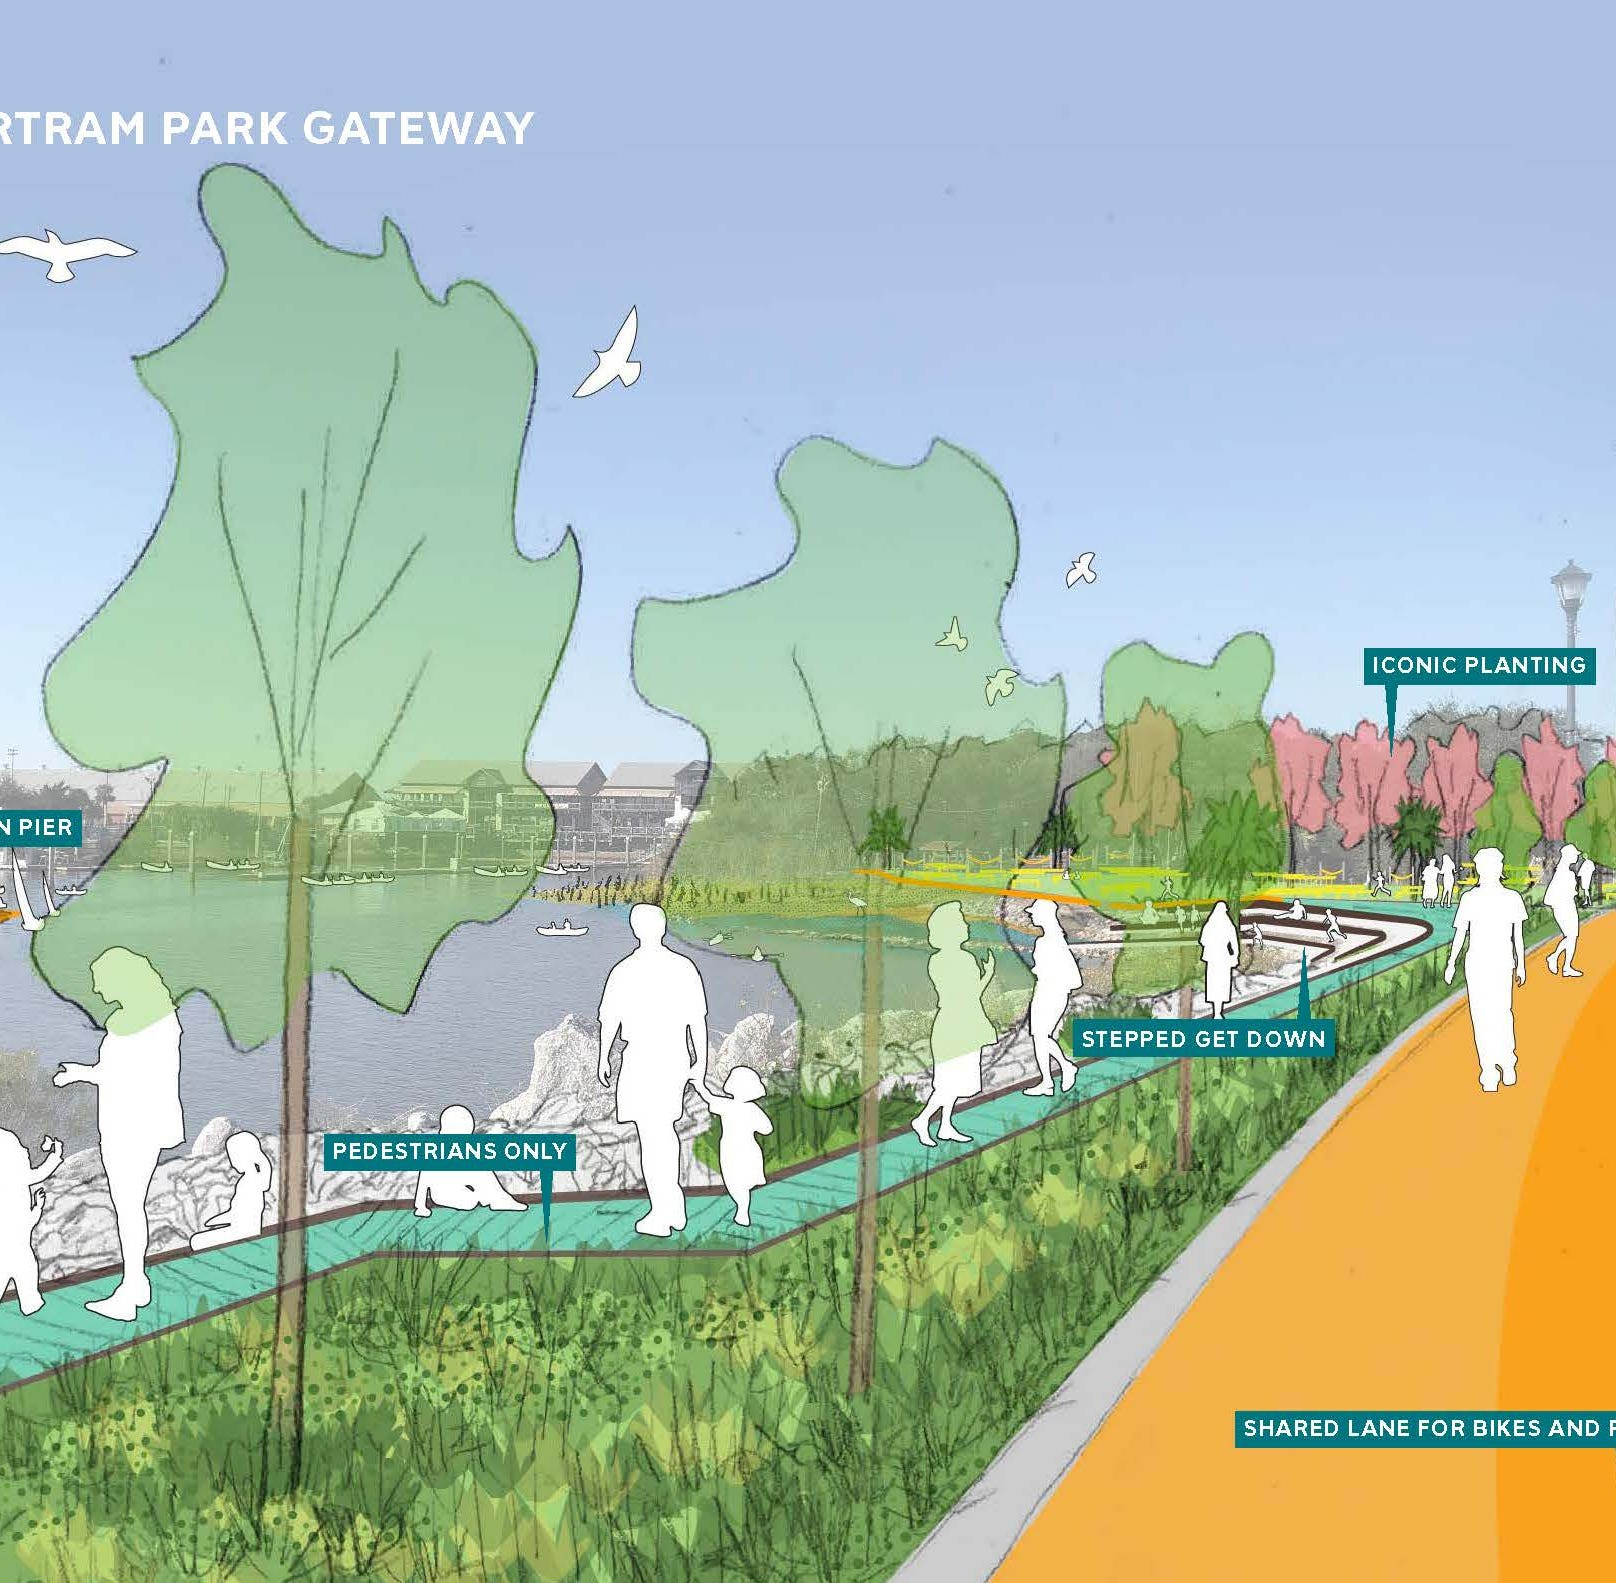 4 key takeaways from SCAPE's Pensacola waterfront framework plan